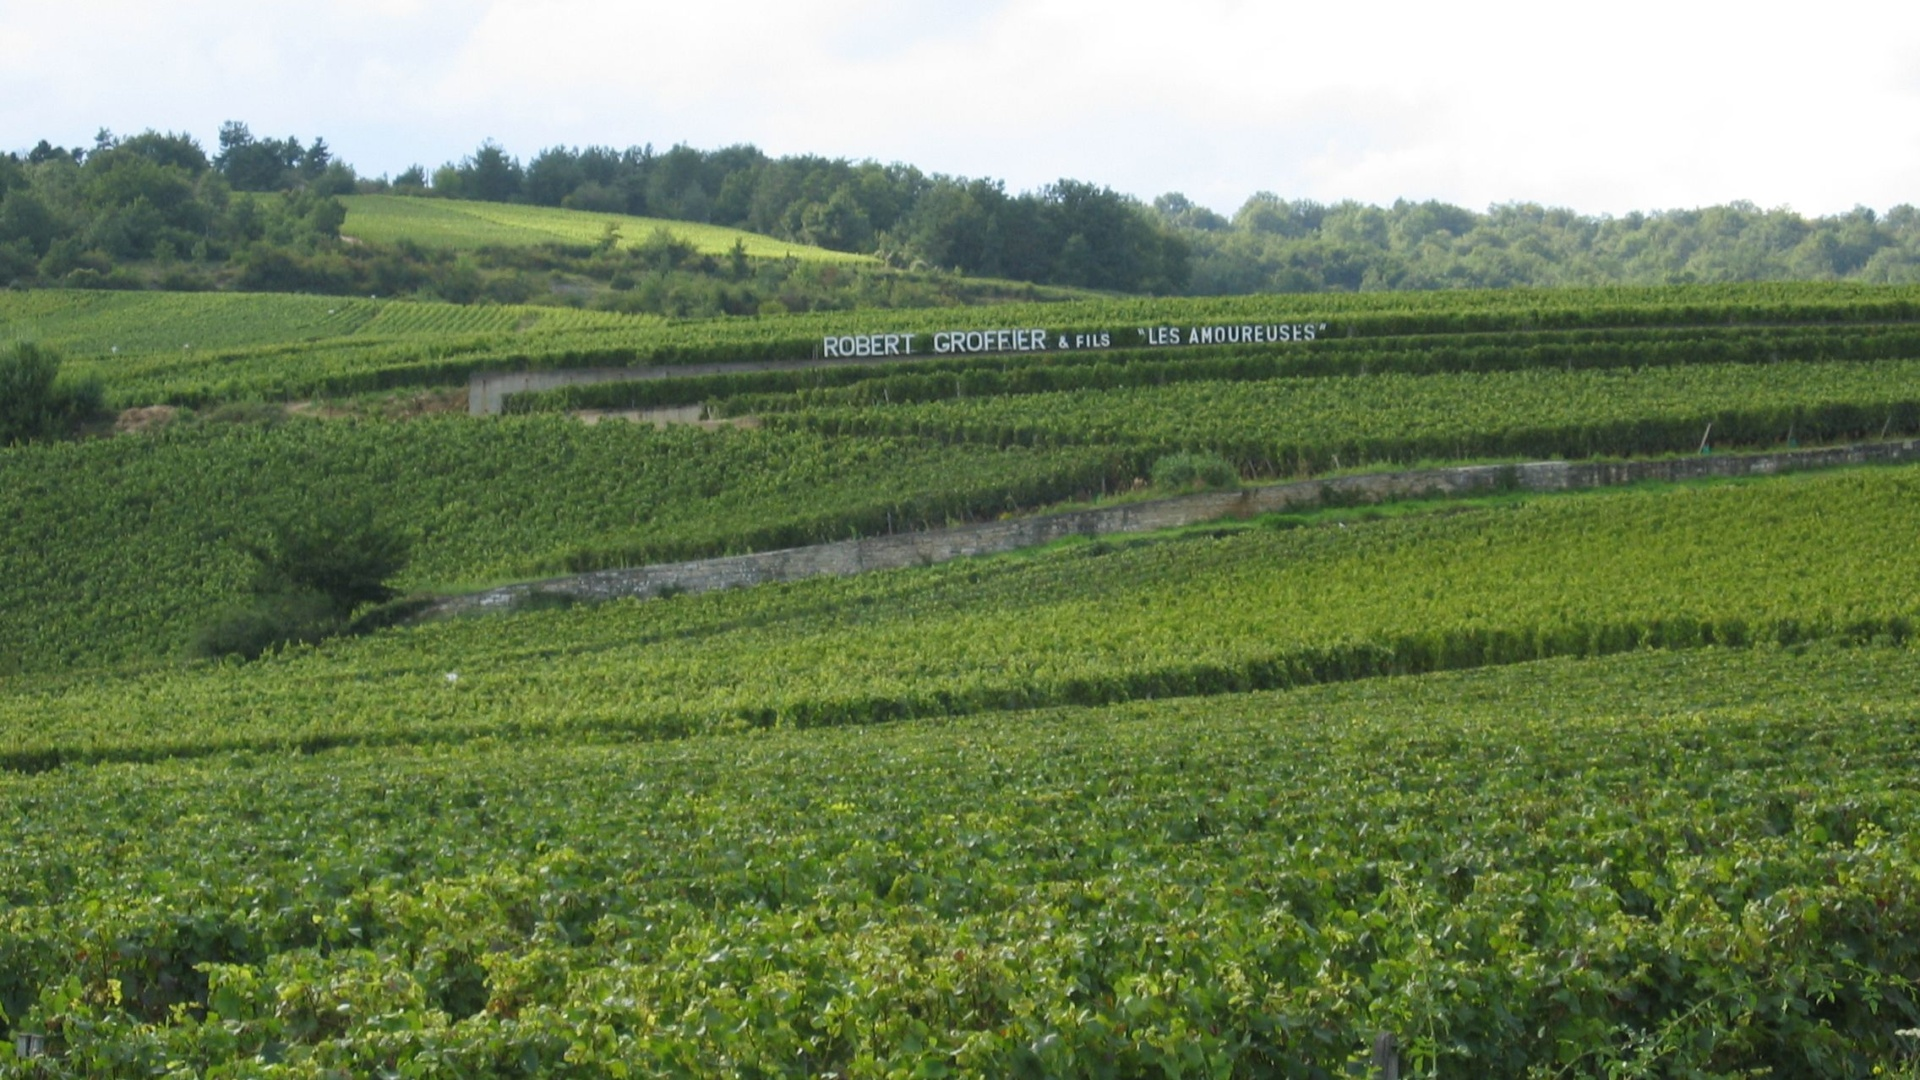 Robert-Groffier-Bourgogne-Côte-de-Nuits-Chambolle-Mussigny-Les-Amoureuses